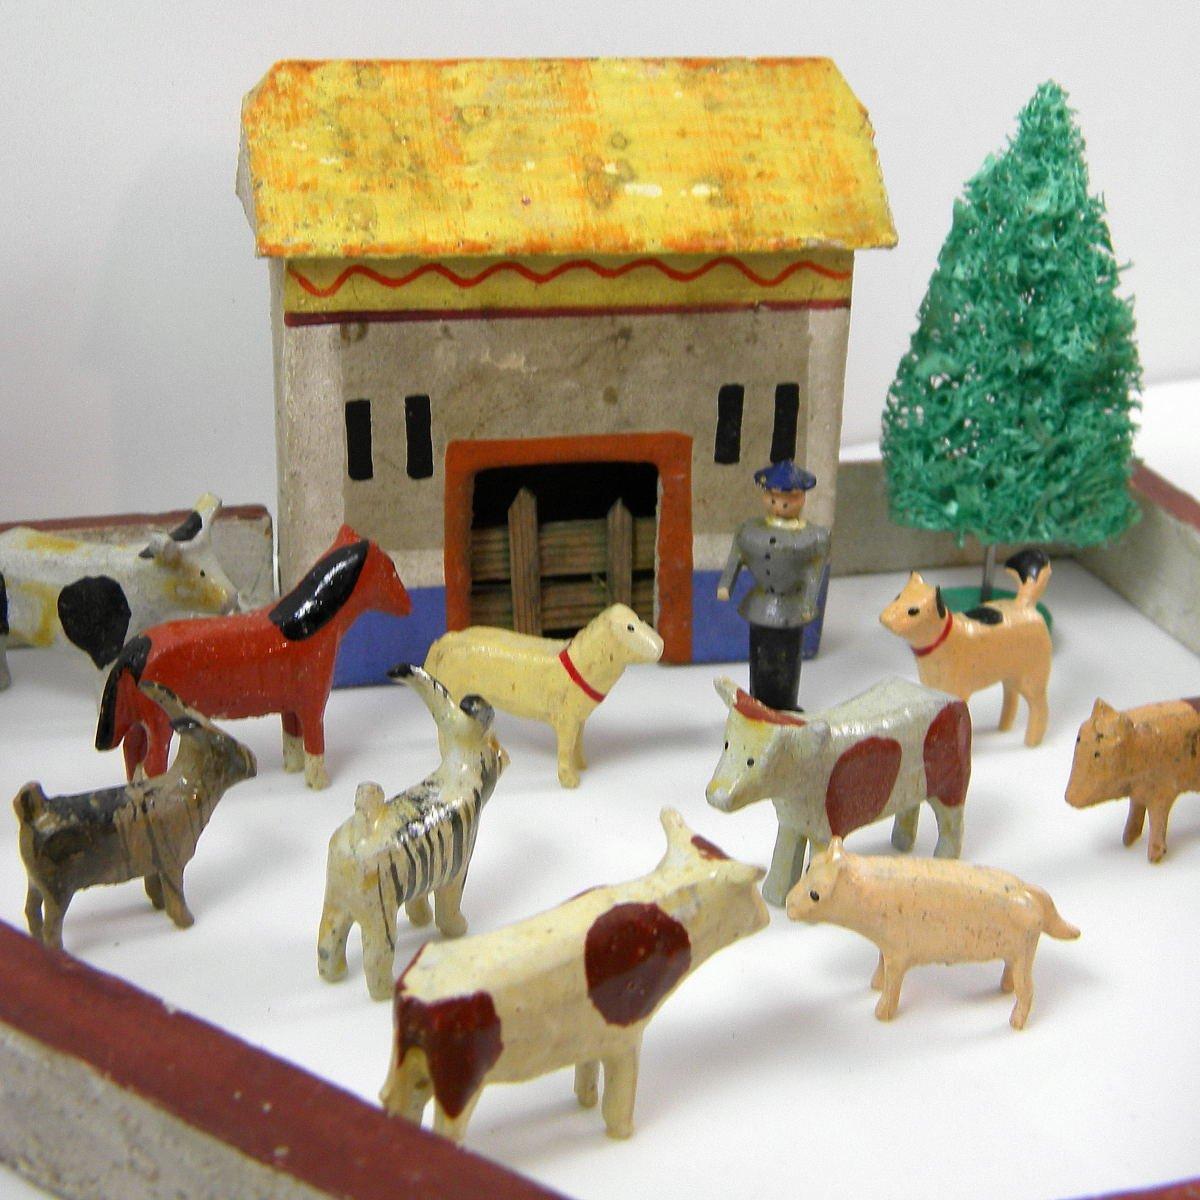 Christmas Tree Gates For Dogs: Antique German Erzgebirge Christmas Putz Barn Miniature